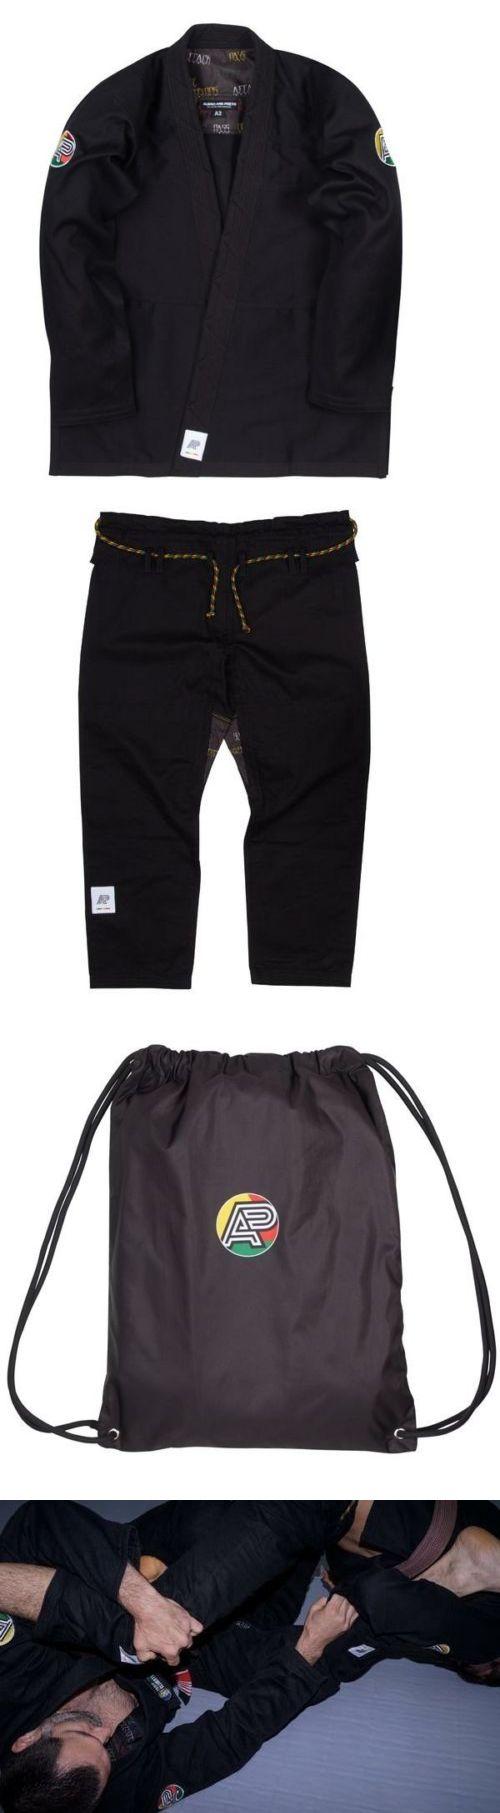 Uniforms and Gis 179774: Albino And Preto Batch 15 Riydm Size A2 Black Shoyoroll Bjj Jiu Jitsu Gi -> BUY IT NOW ONLY: $280 on eBay!